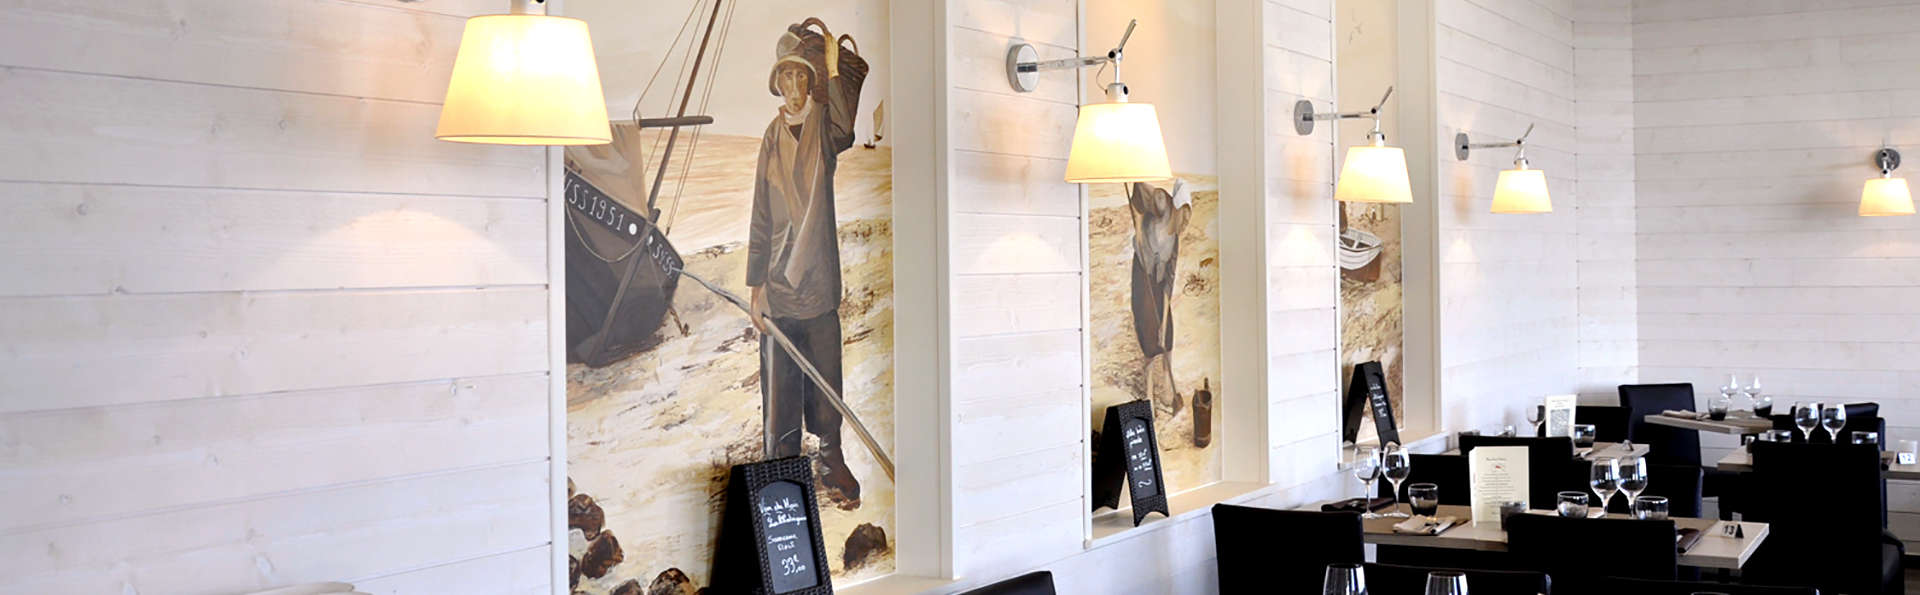 Hôtel du Port et Restaurant des Bains - Edit_Restaurant2.jpg